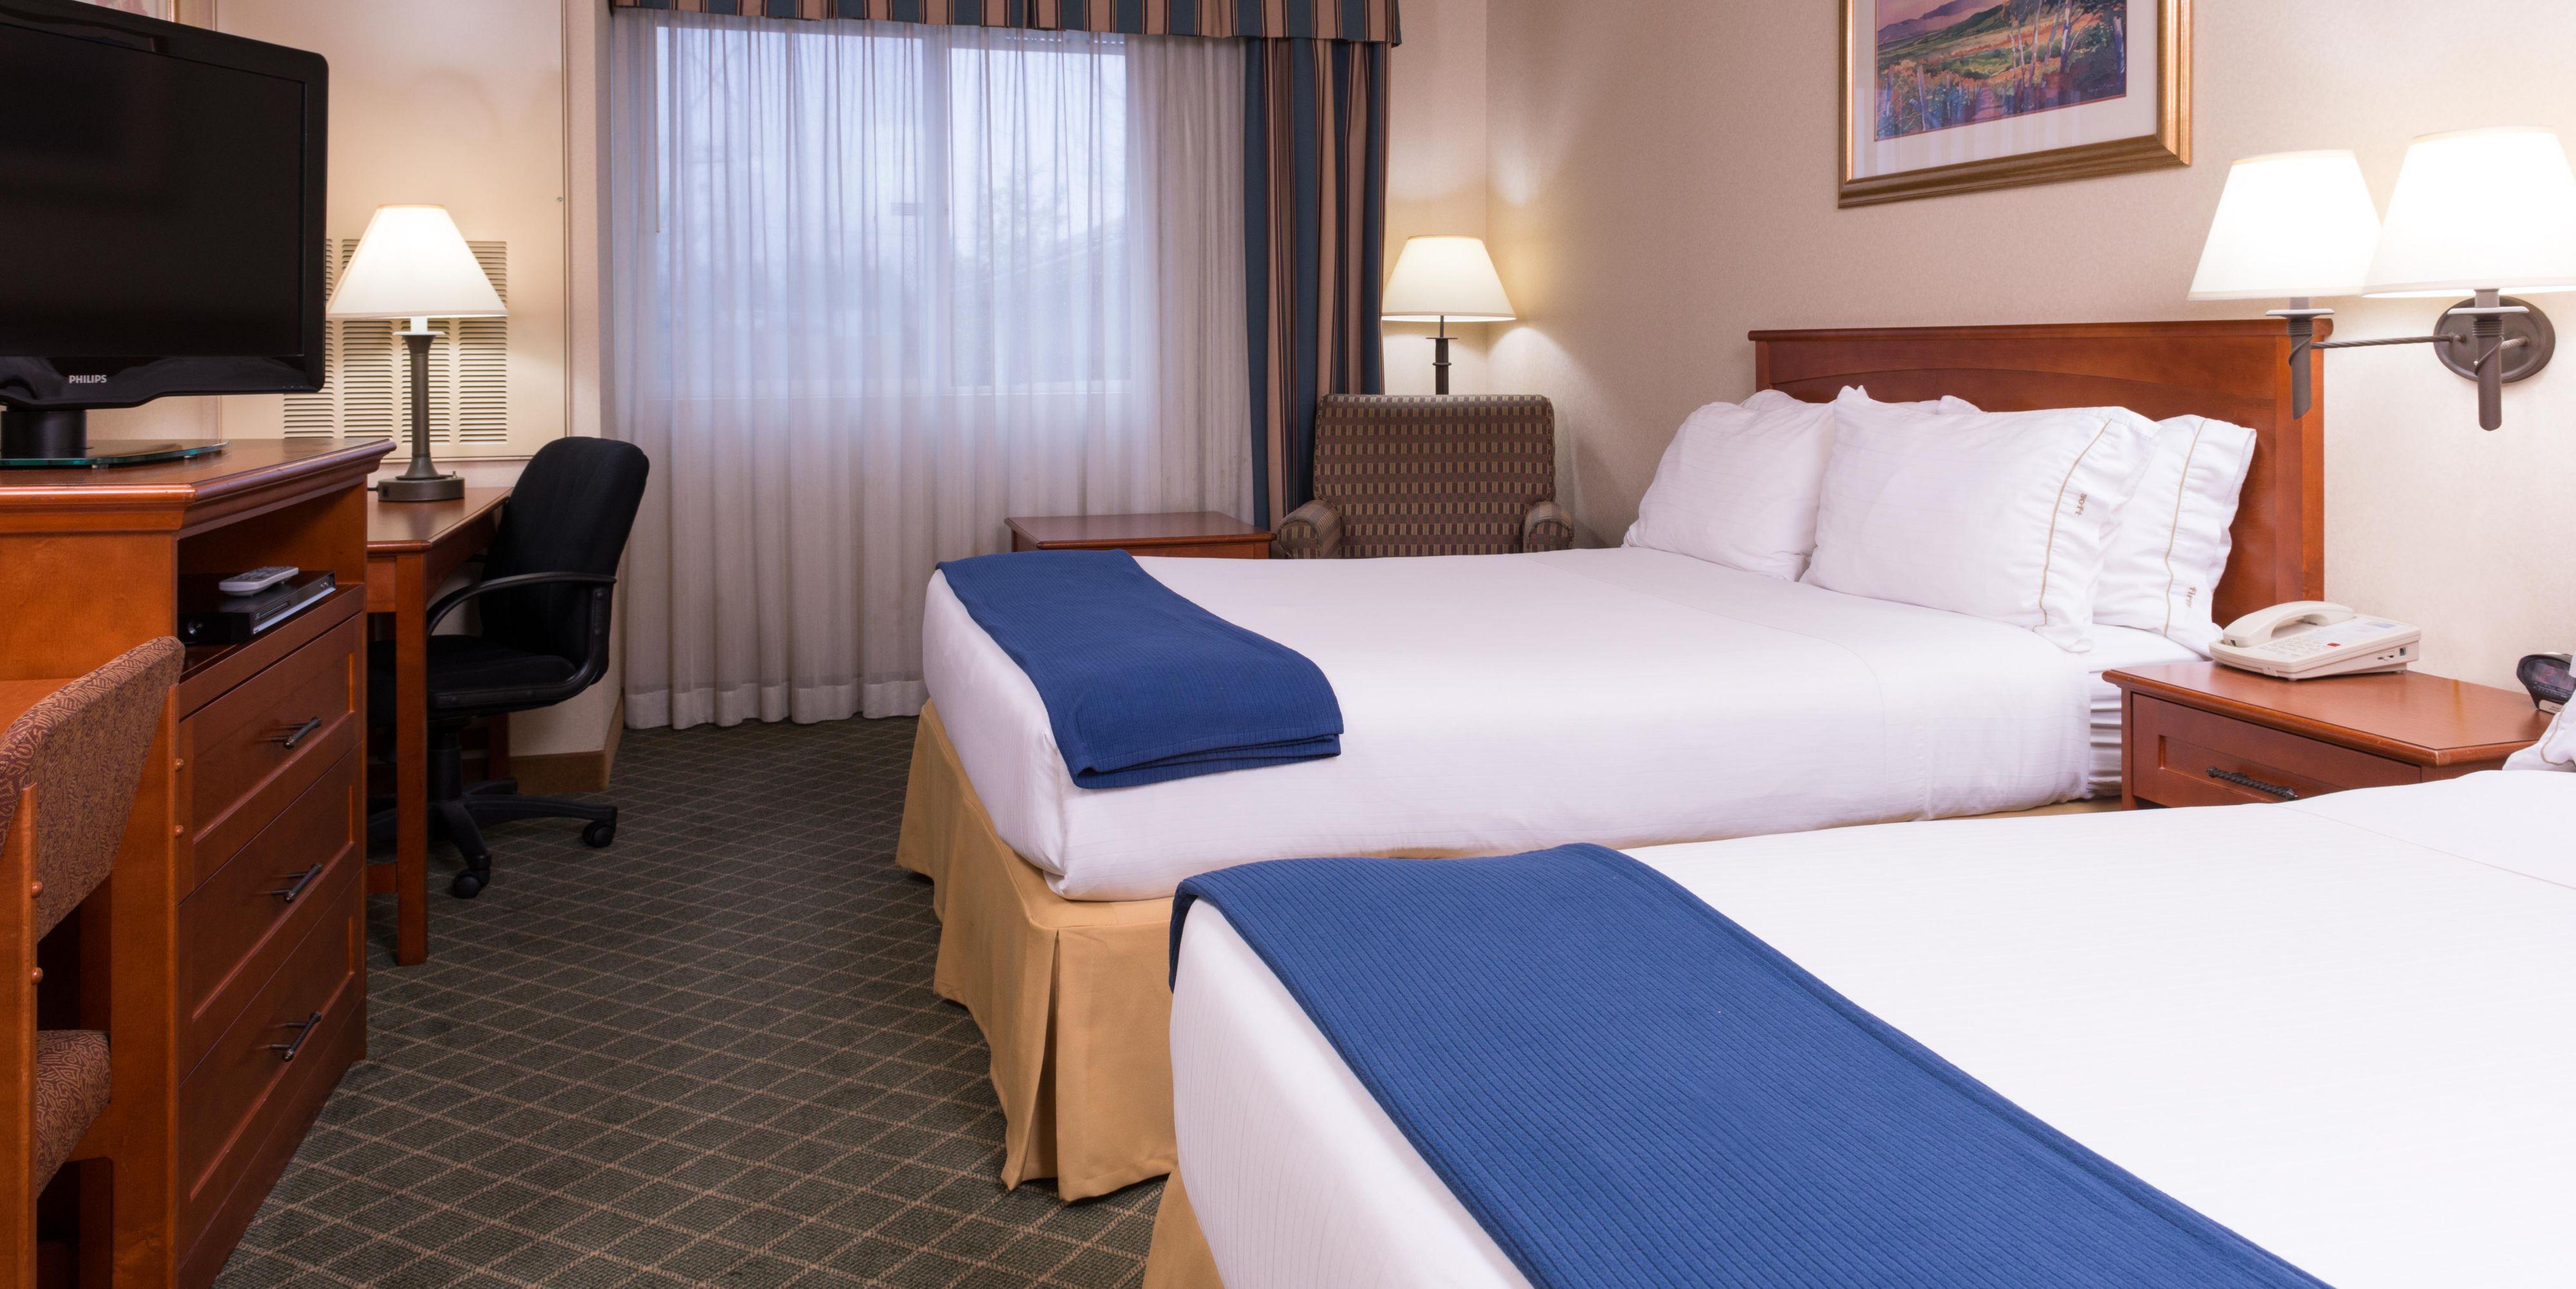 Bedroom Sets Everett Wa holiday inn express & suites everett hotelihg